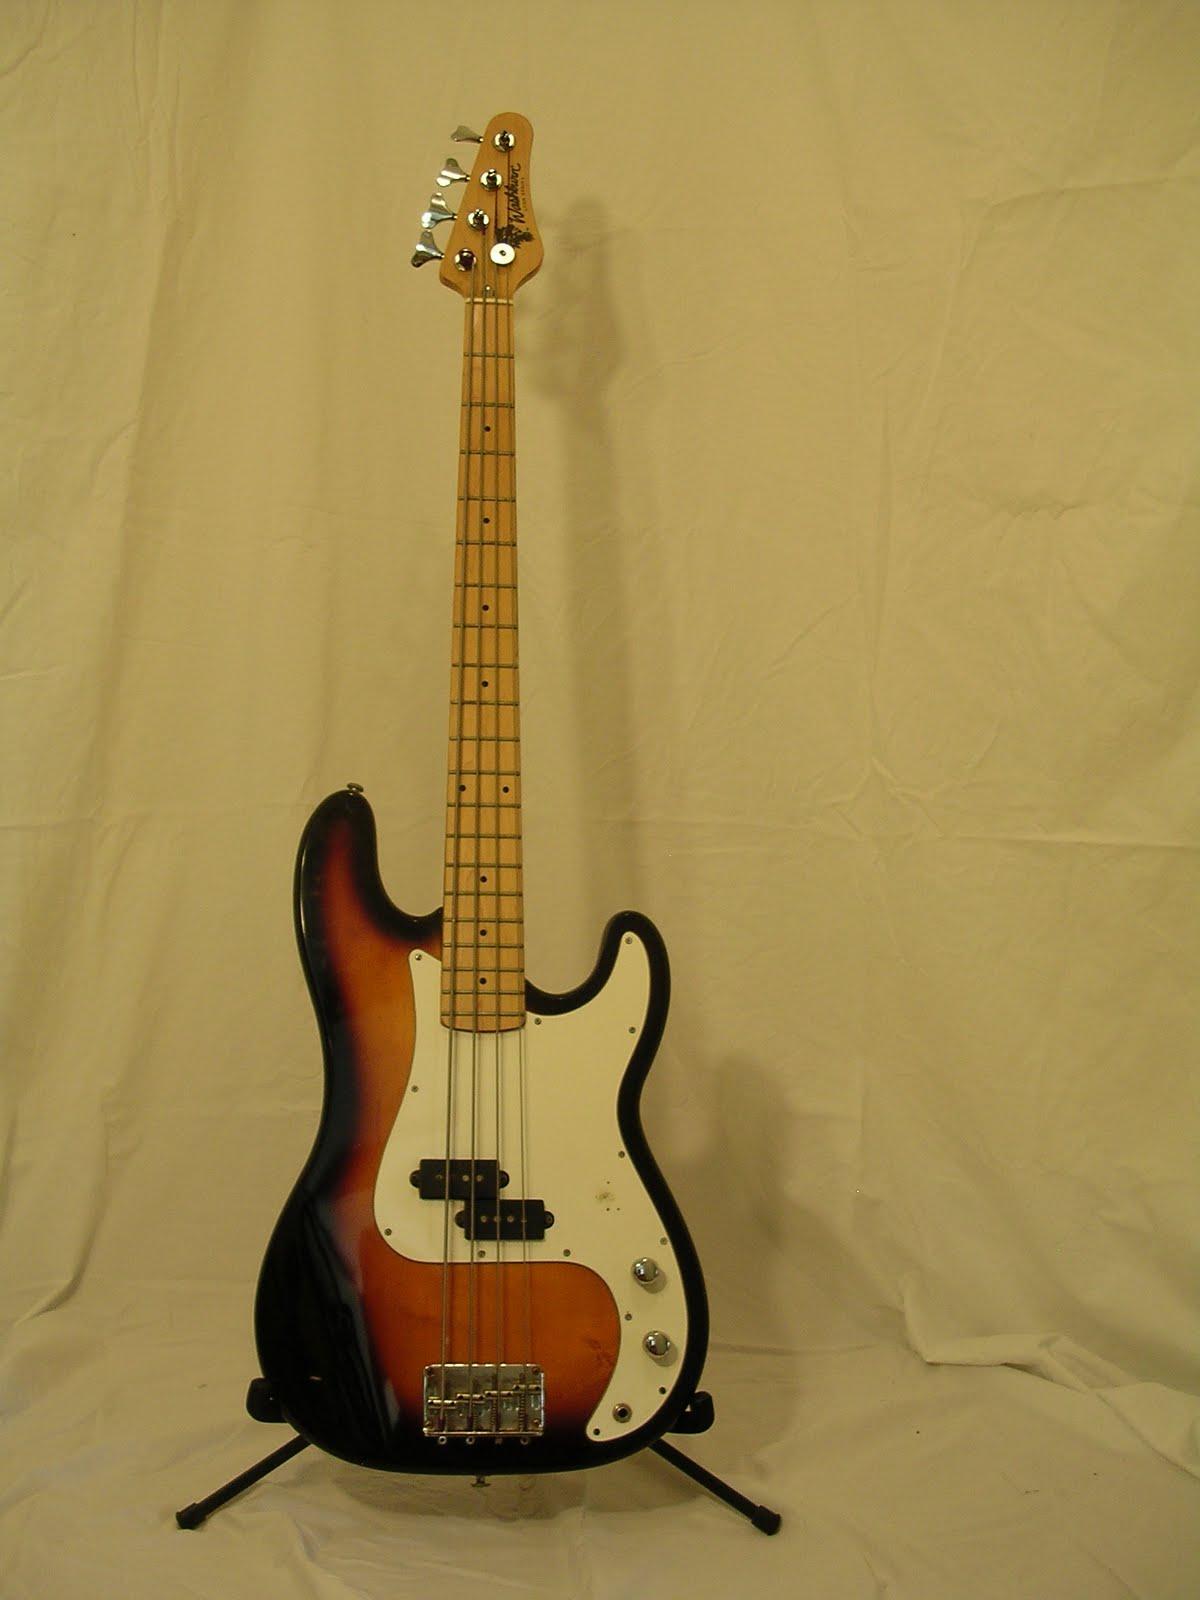 Lyon Strat Guitars Washburn Guitar Wiring Diagram Electric Bass 1200x1600